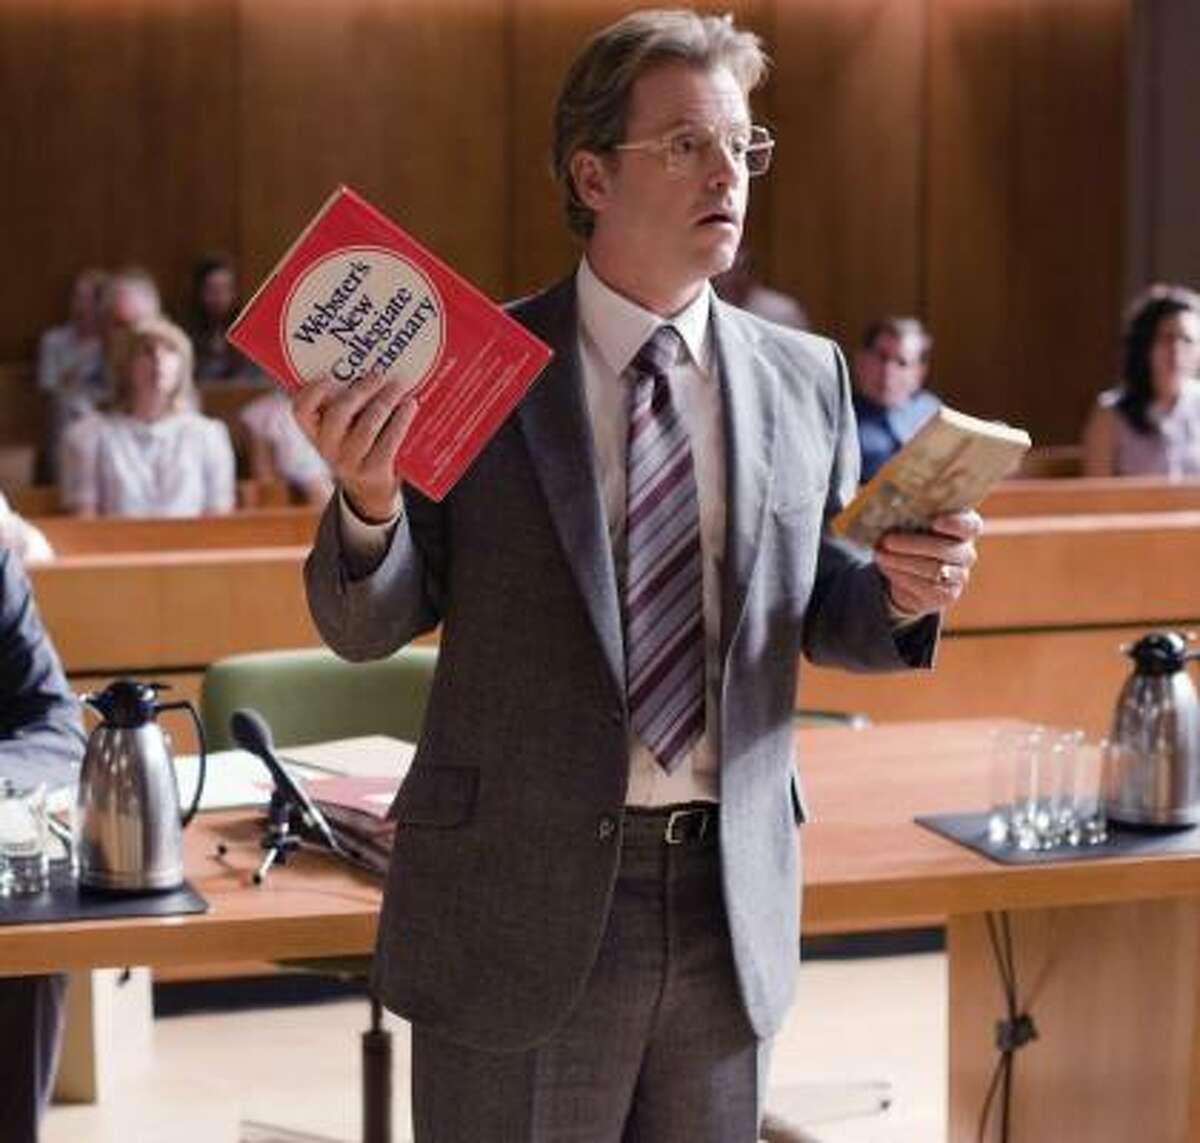 Greg Kinnear, as Bob Kearns, makes his case in court in Flash of Genius.